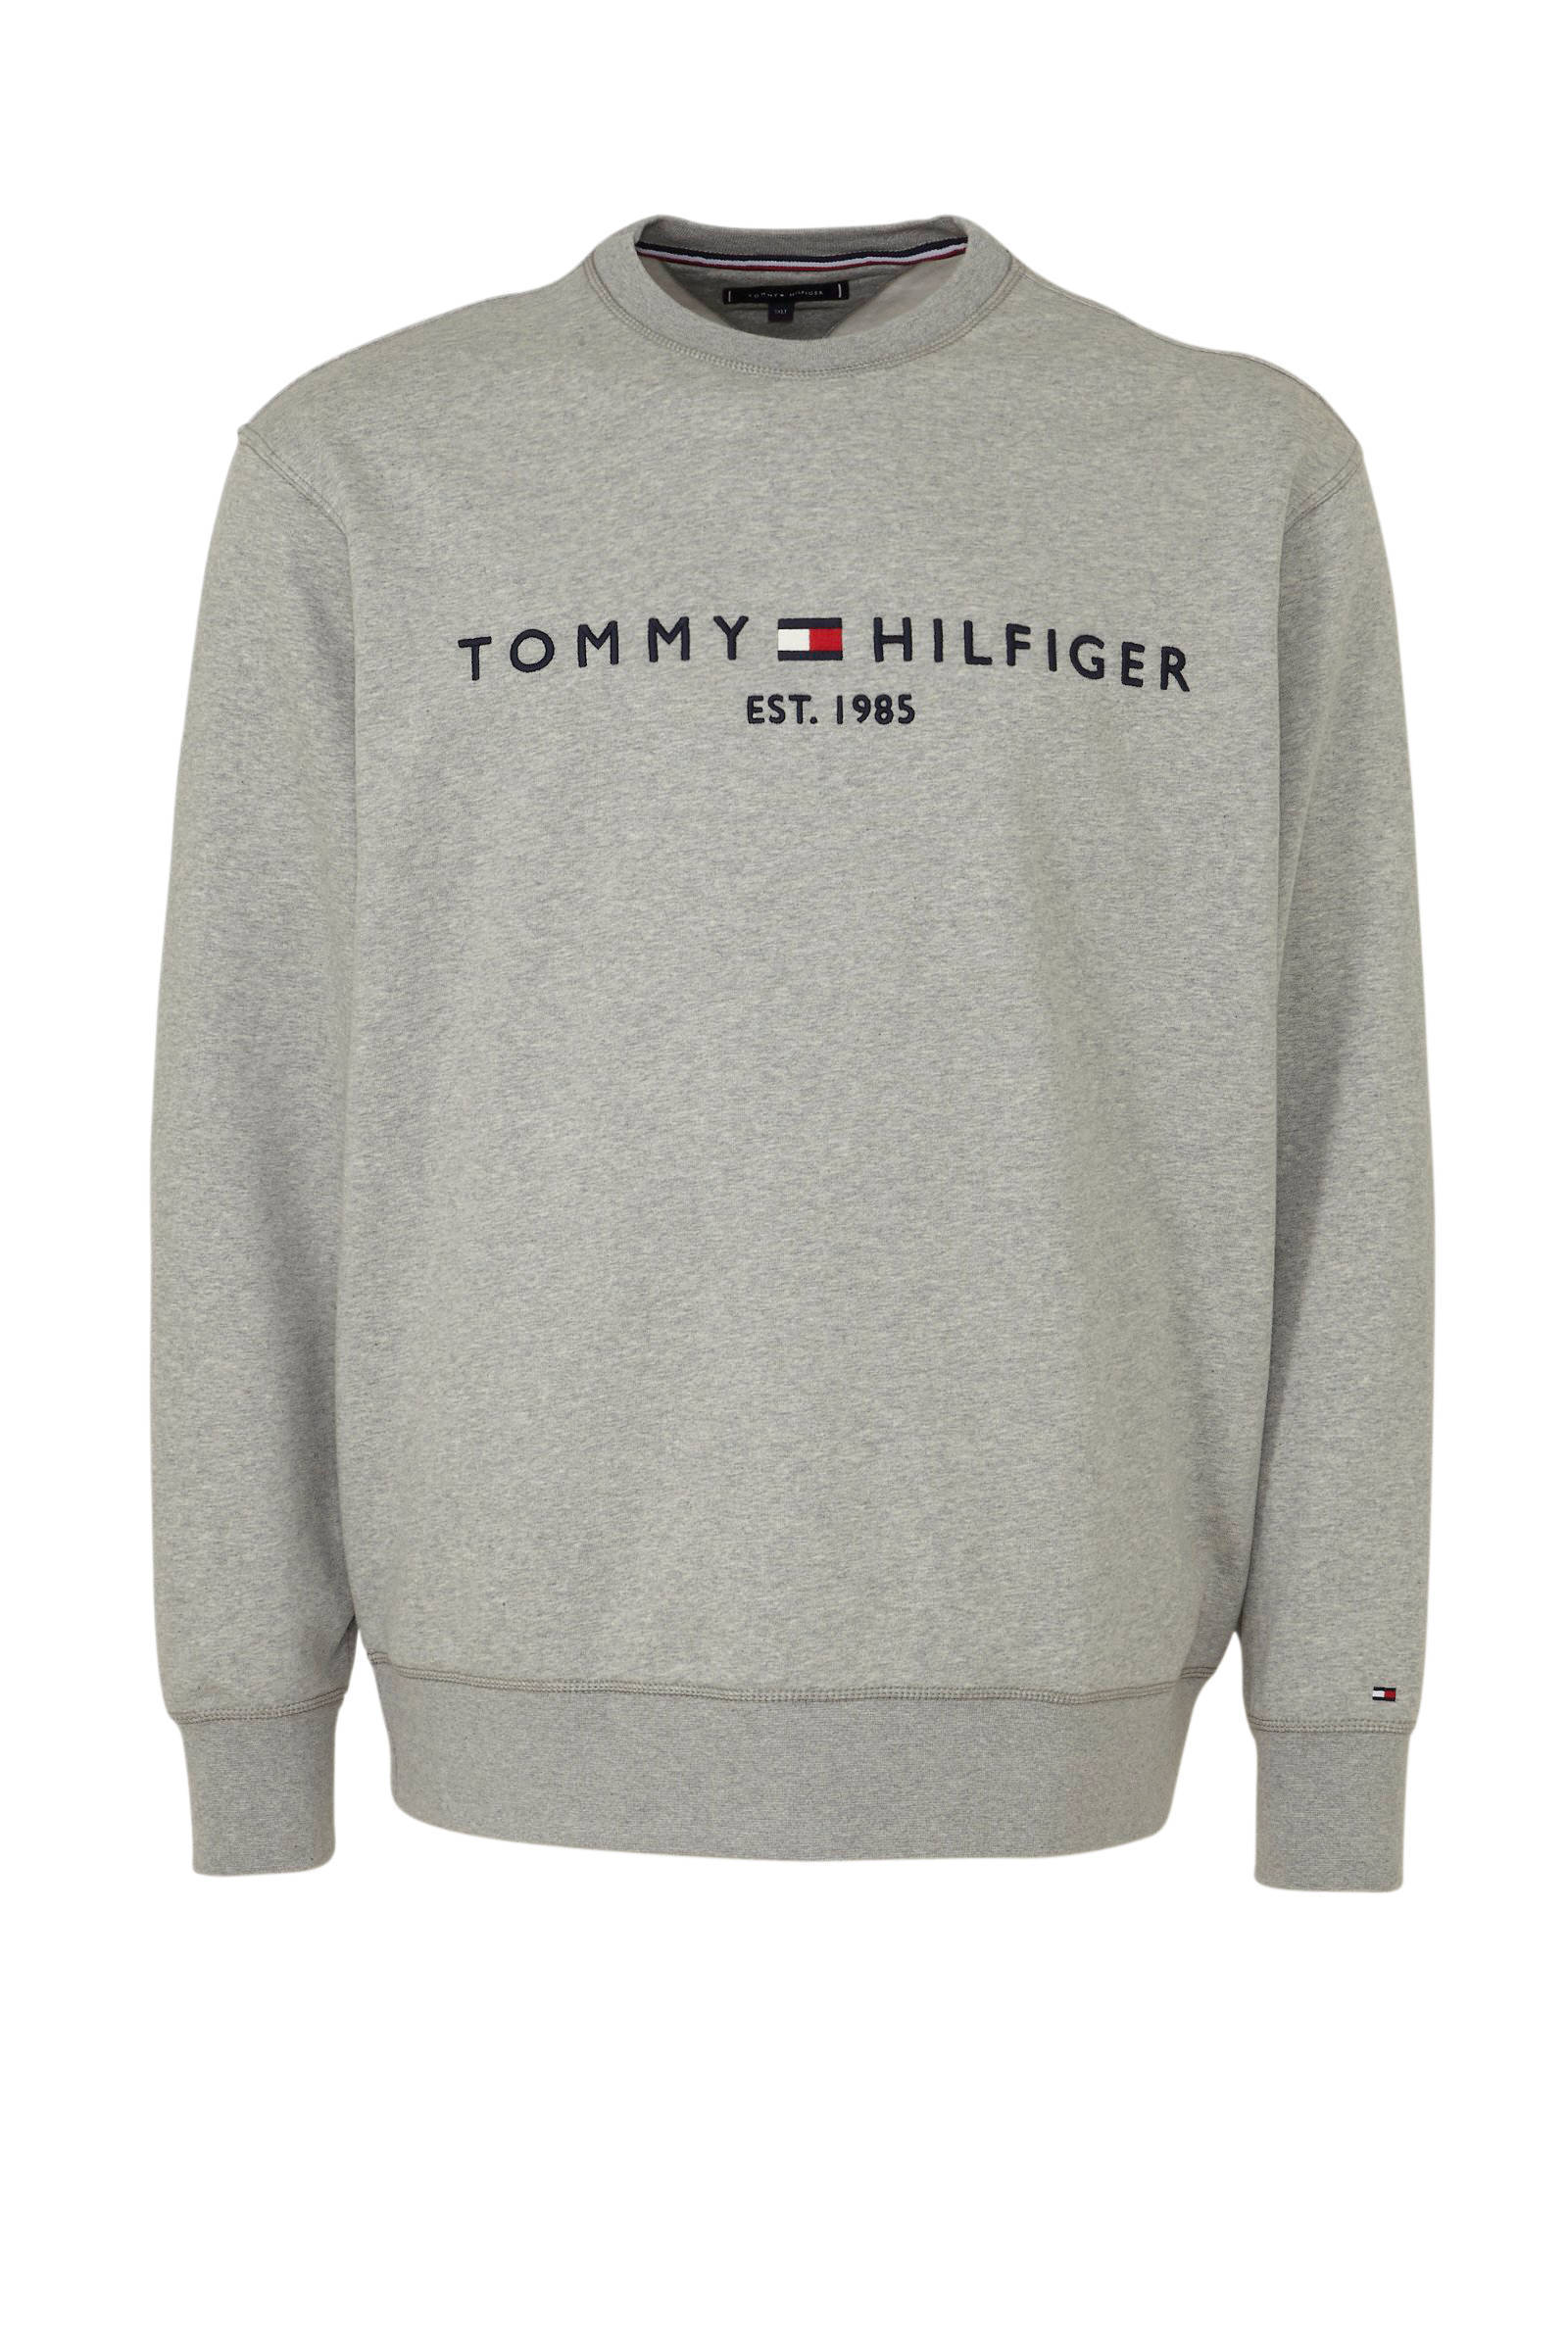 Tommy Hilfiger Big & Tall heren sweaters bij wehkamp